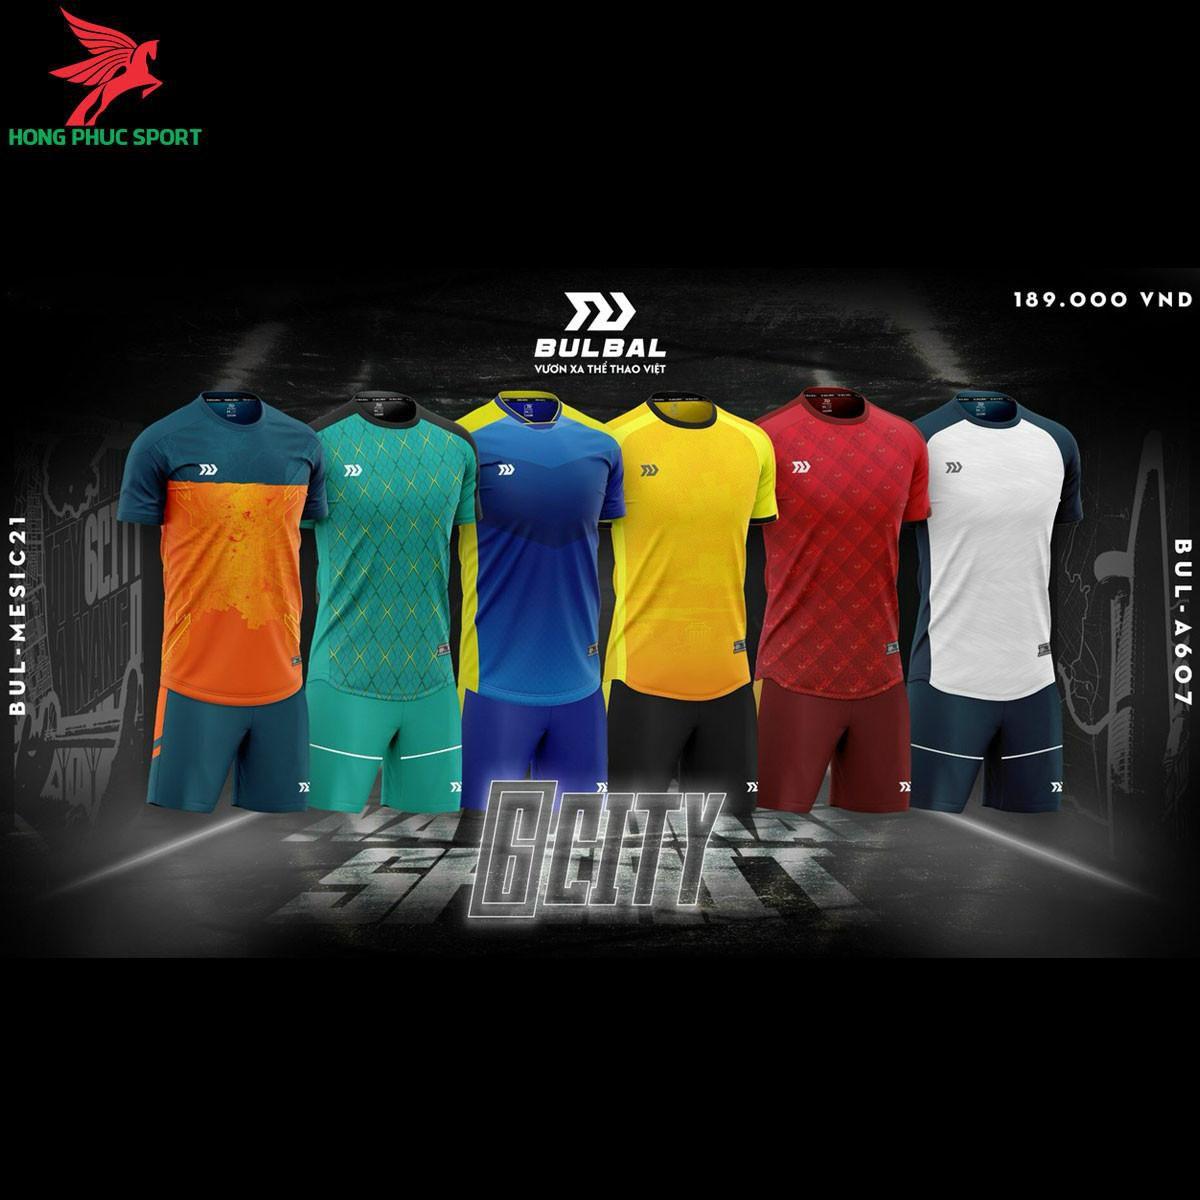 https://cdn.hongphucsport.com/unsafe/s4.shopbay.vn/files/285/ao-bong-da-khong-logo-bulbal-6city-1-604735e0469e7.jpg